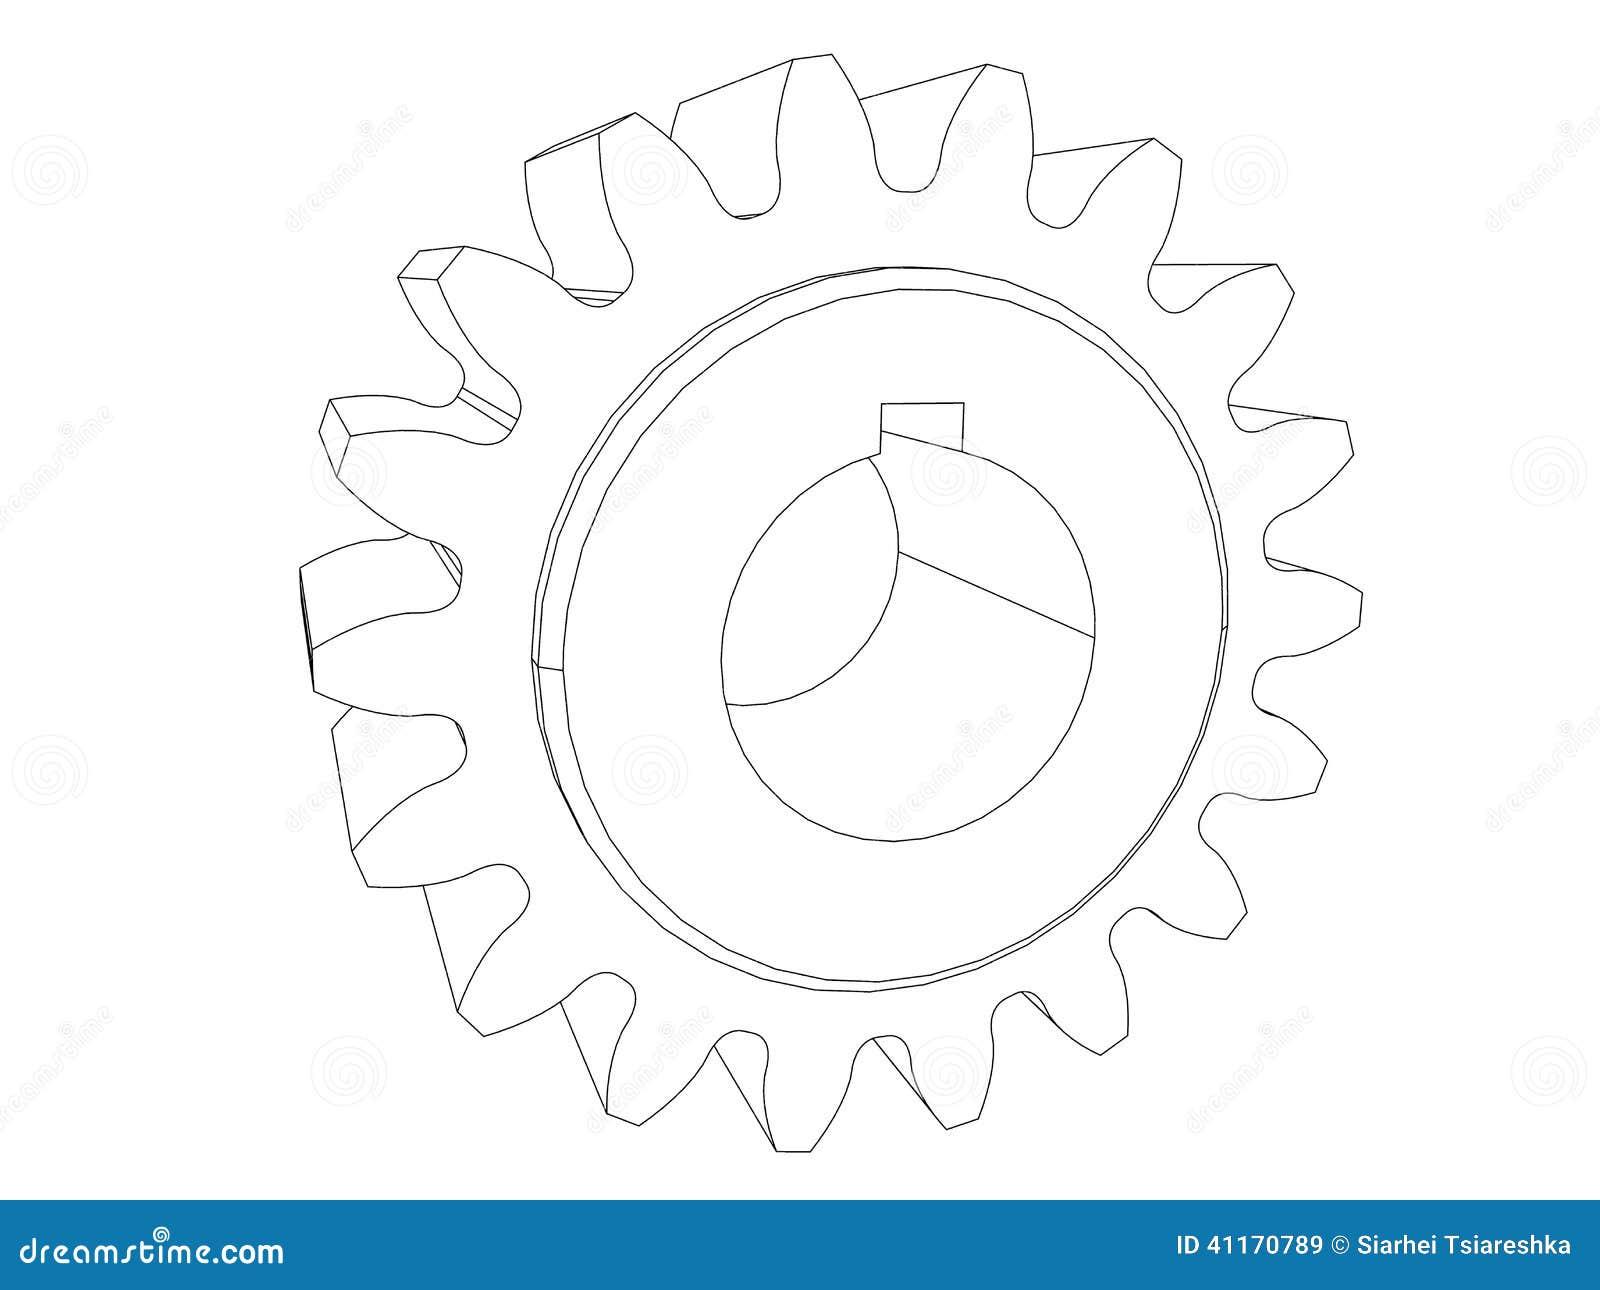 gear engineering drawing black line stock image image